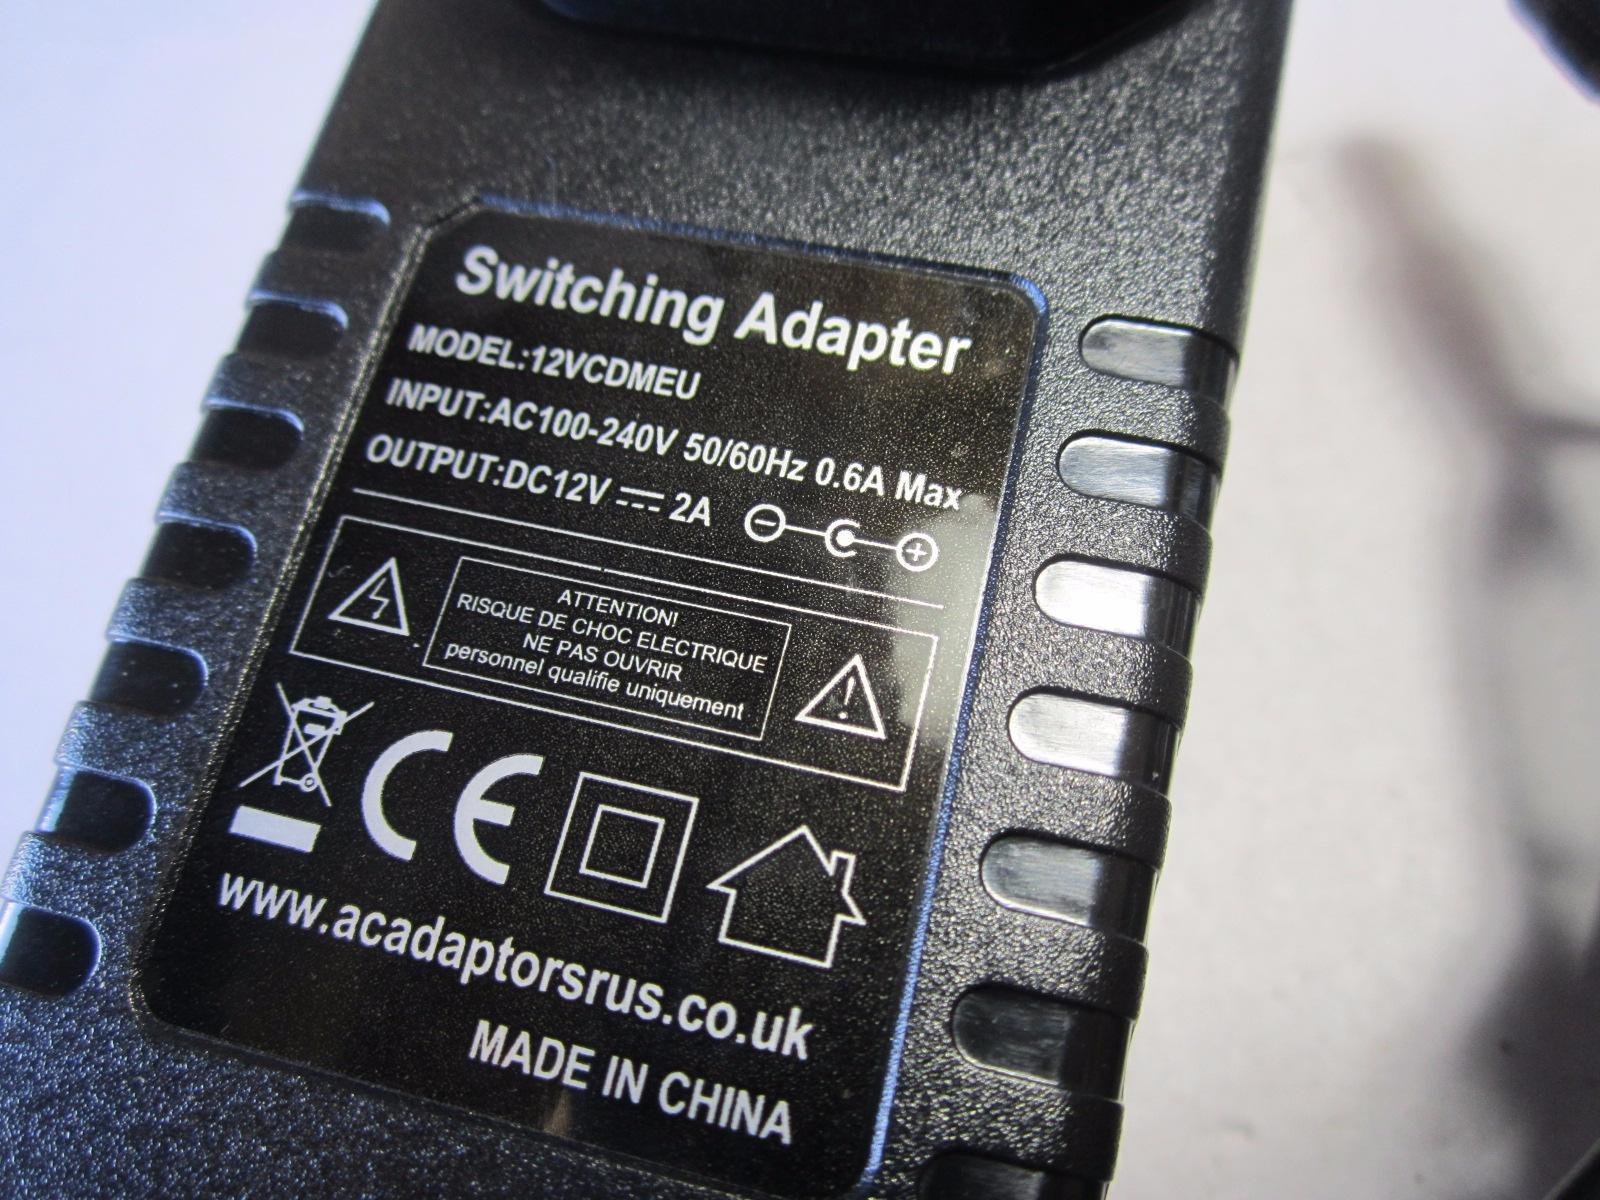 Goodmans-GDVD62WLCD-Portable-DVD-Player-12V-AC-Adaptor-Power-Supply-Charger-EU